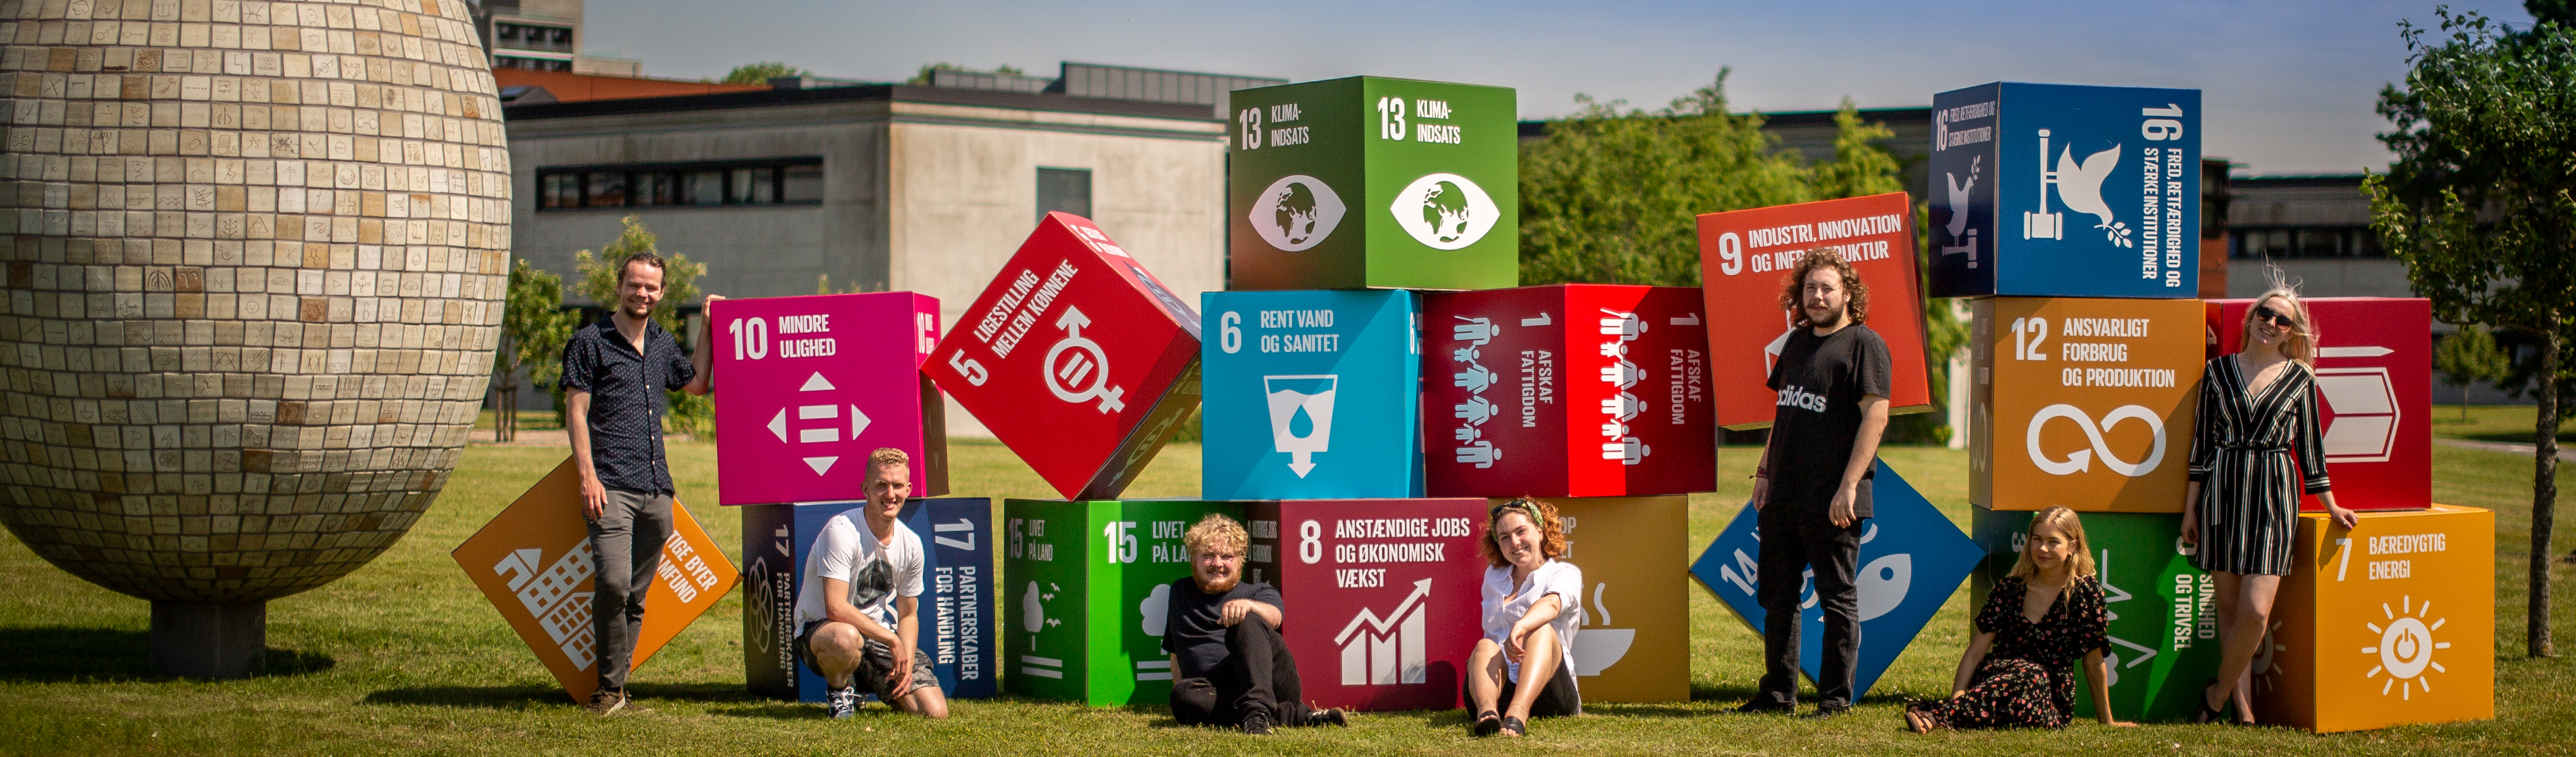 SDU vil være det første bæredygtige universitet i Danmark. Foto: SDU